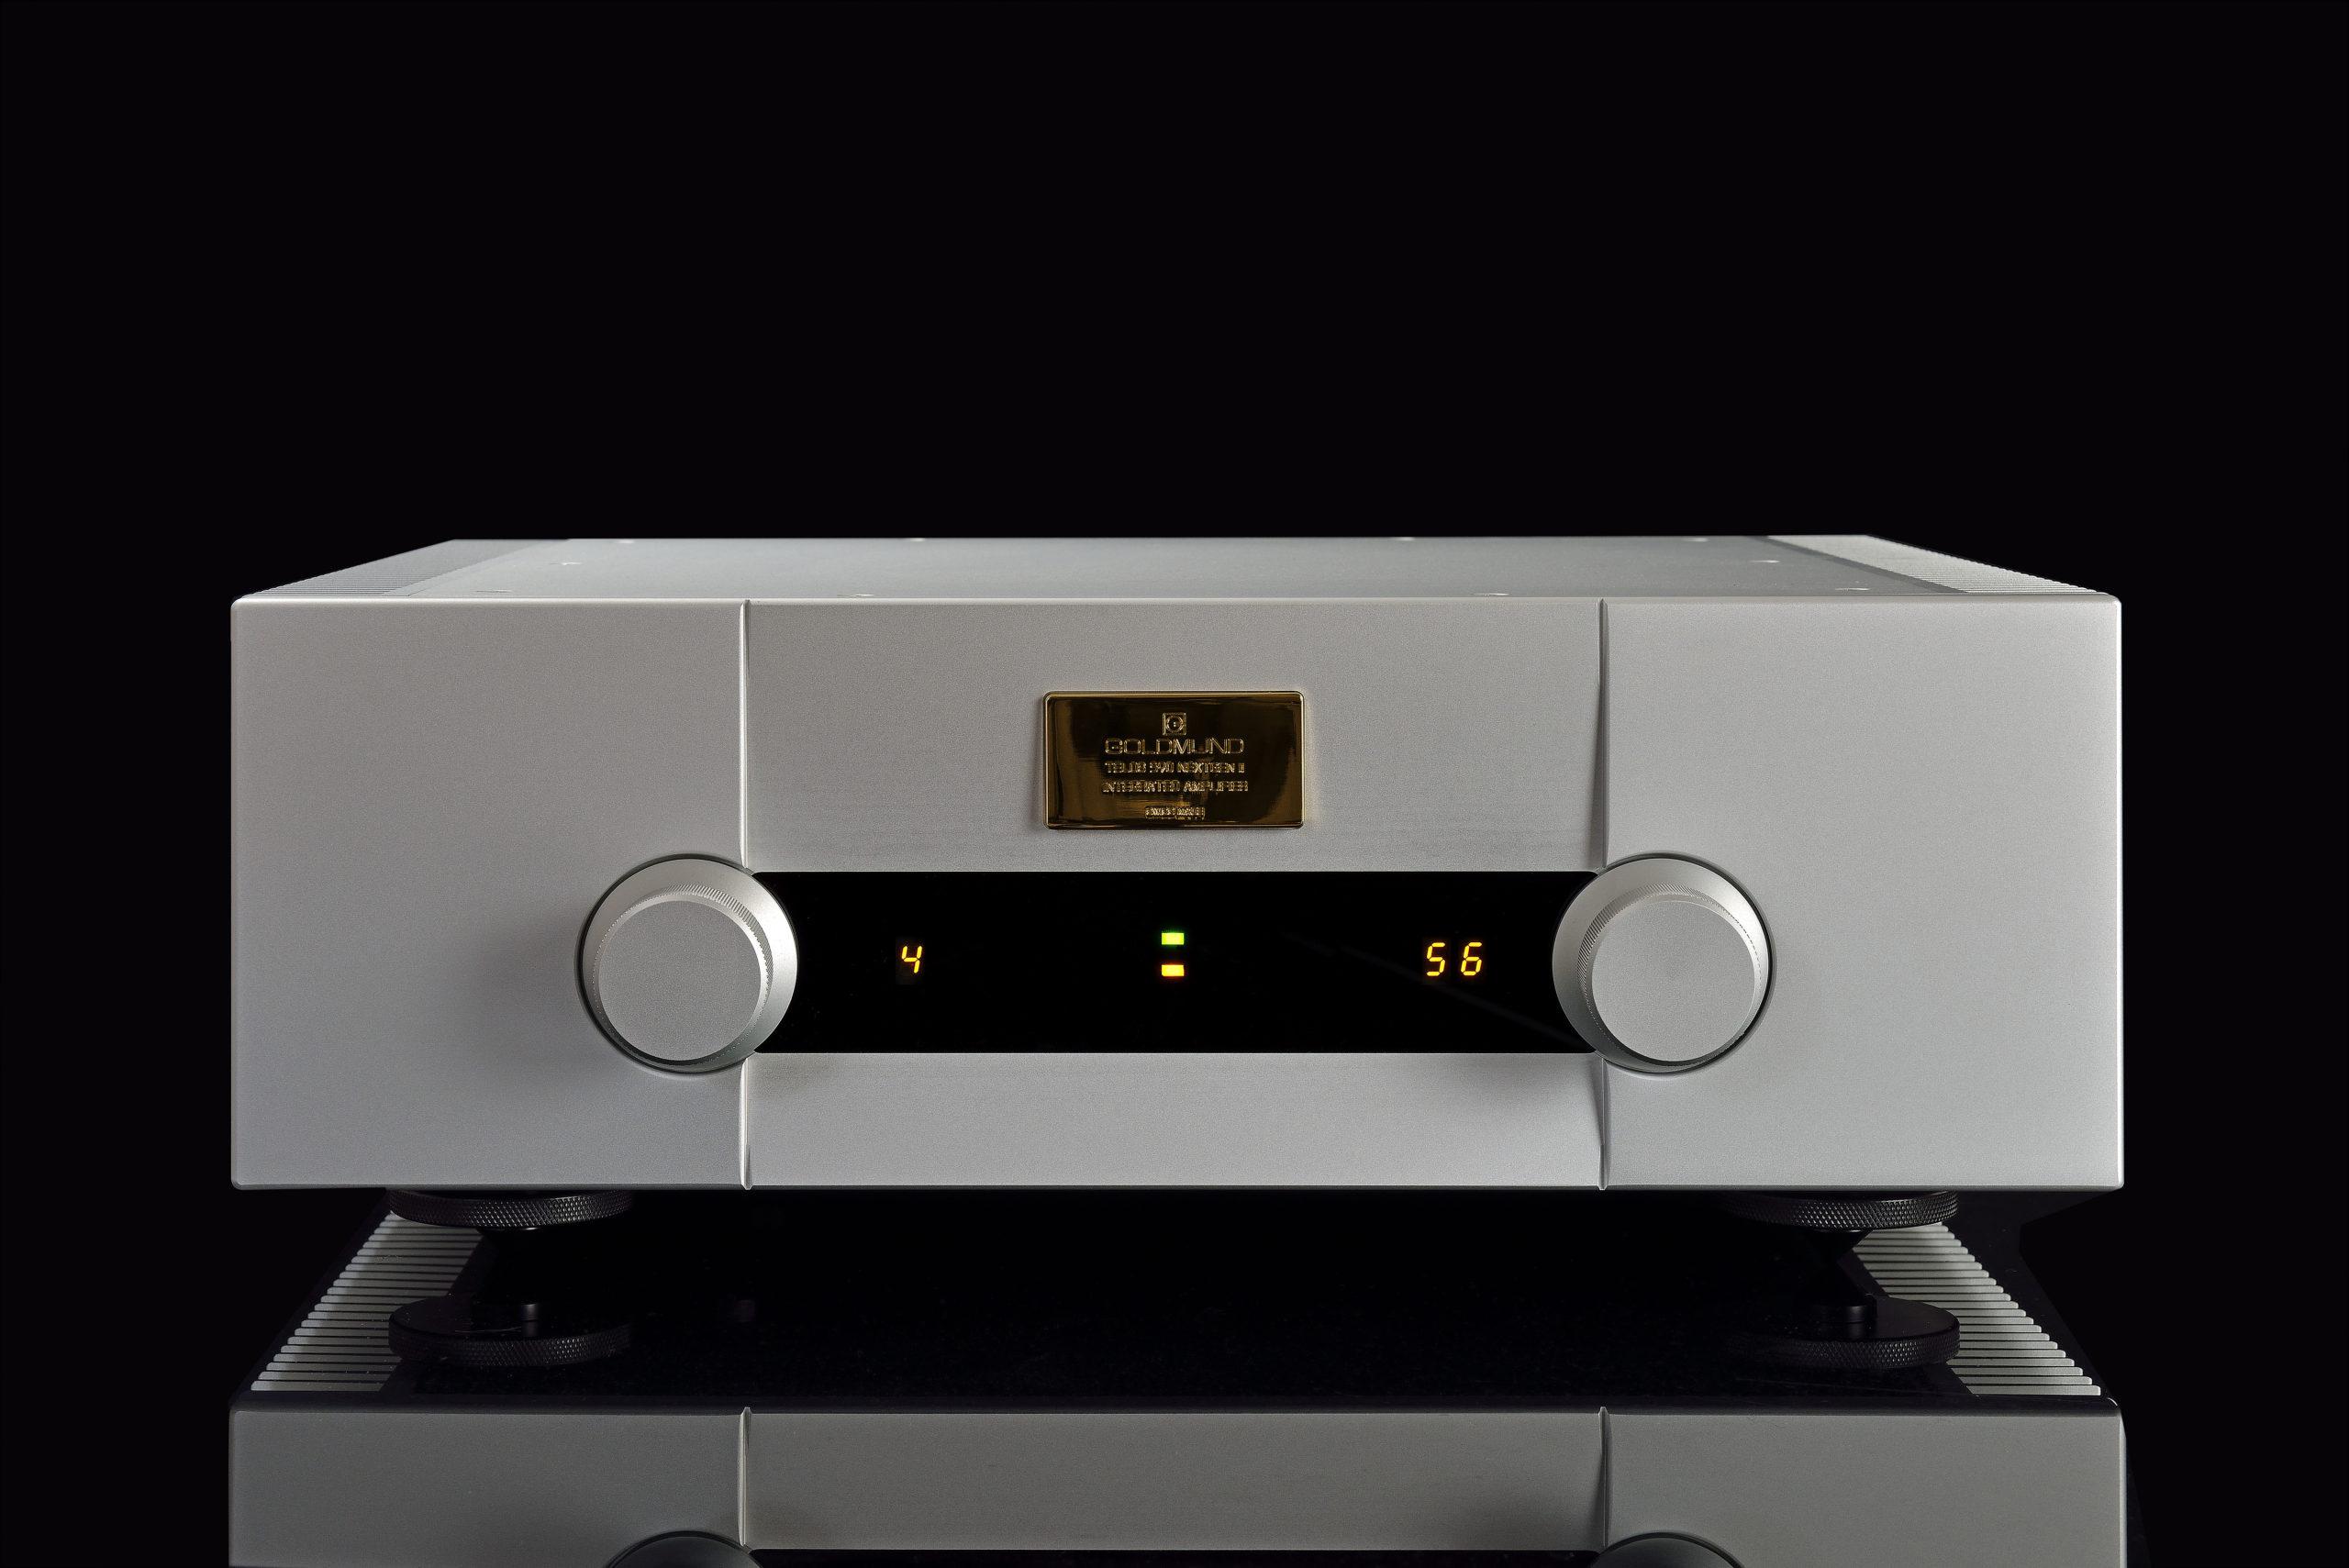 Goldmund Telos 590 Nextgen II Integrated Amplifier